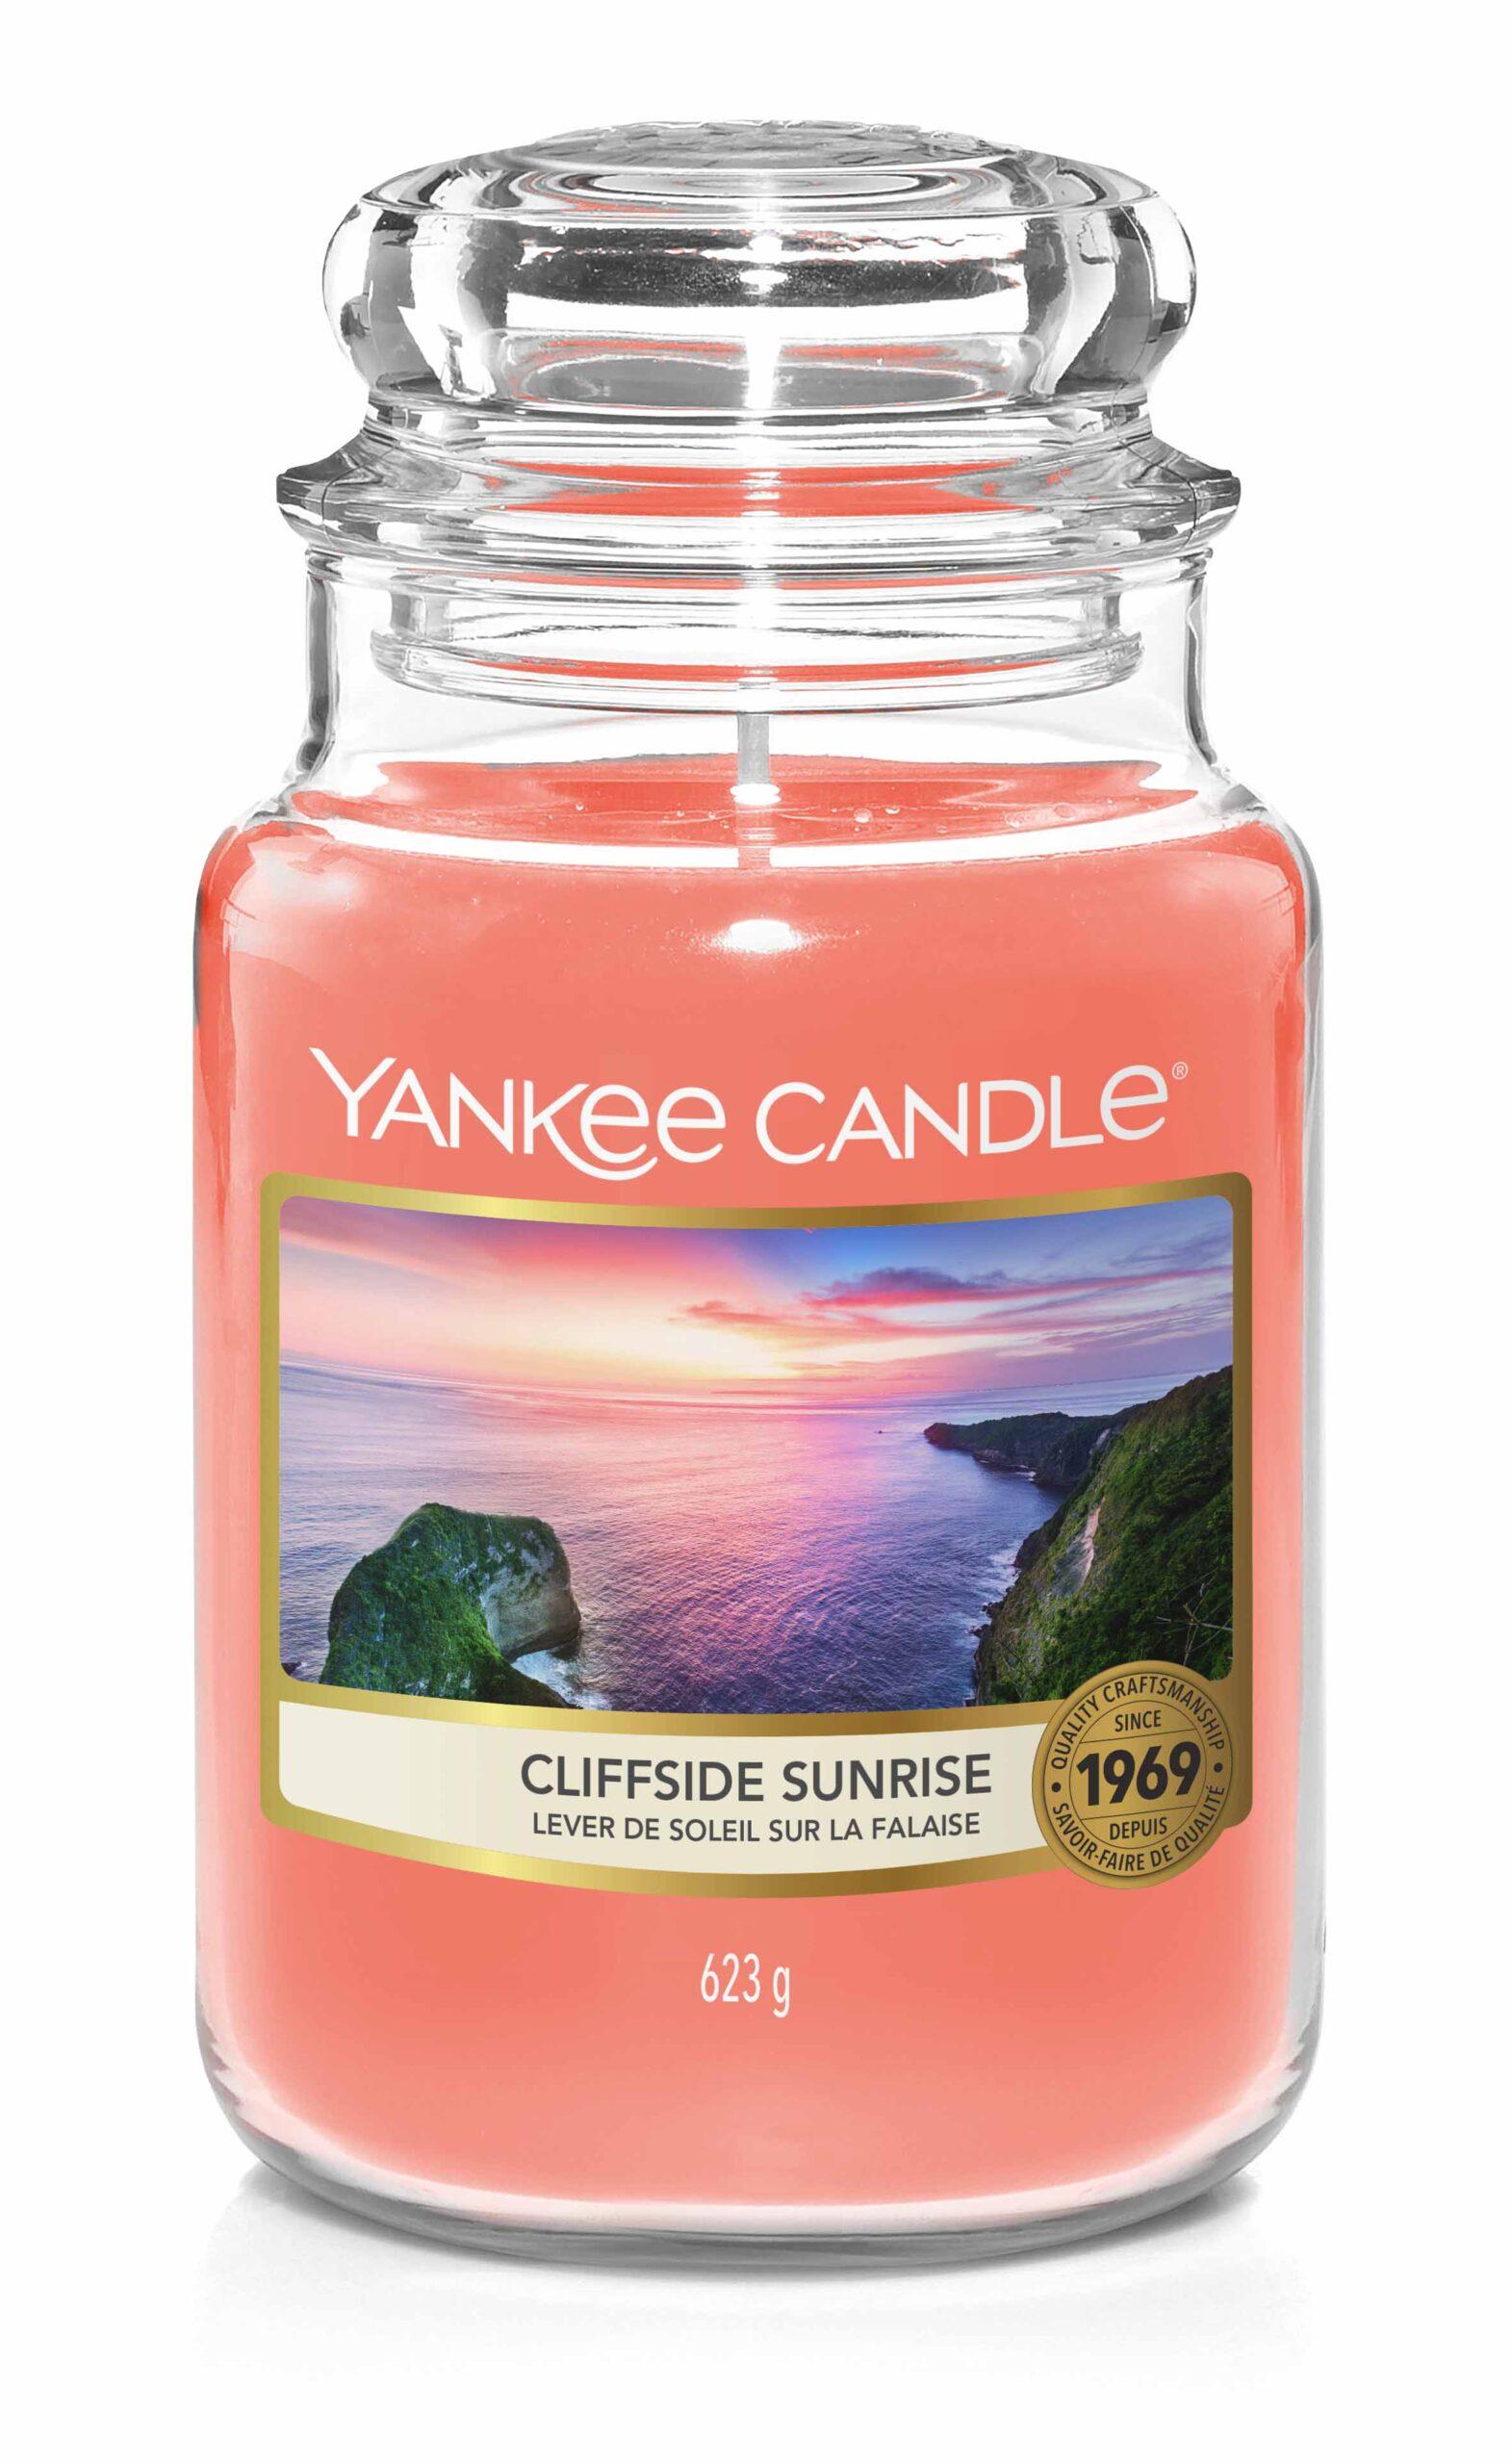 YANKEE CANDLE Cliffside Sunrise